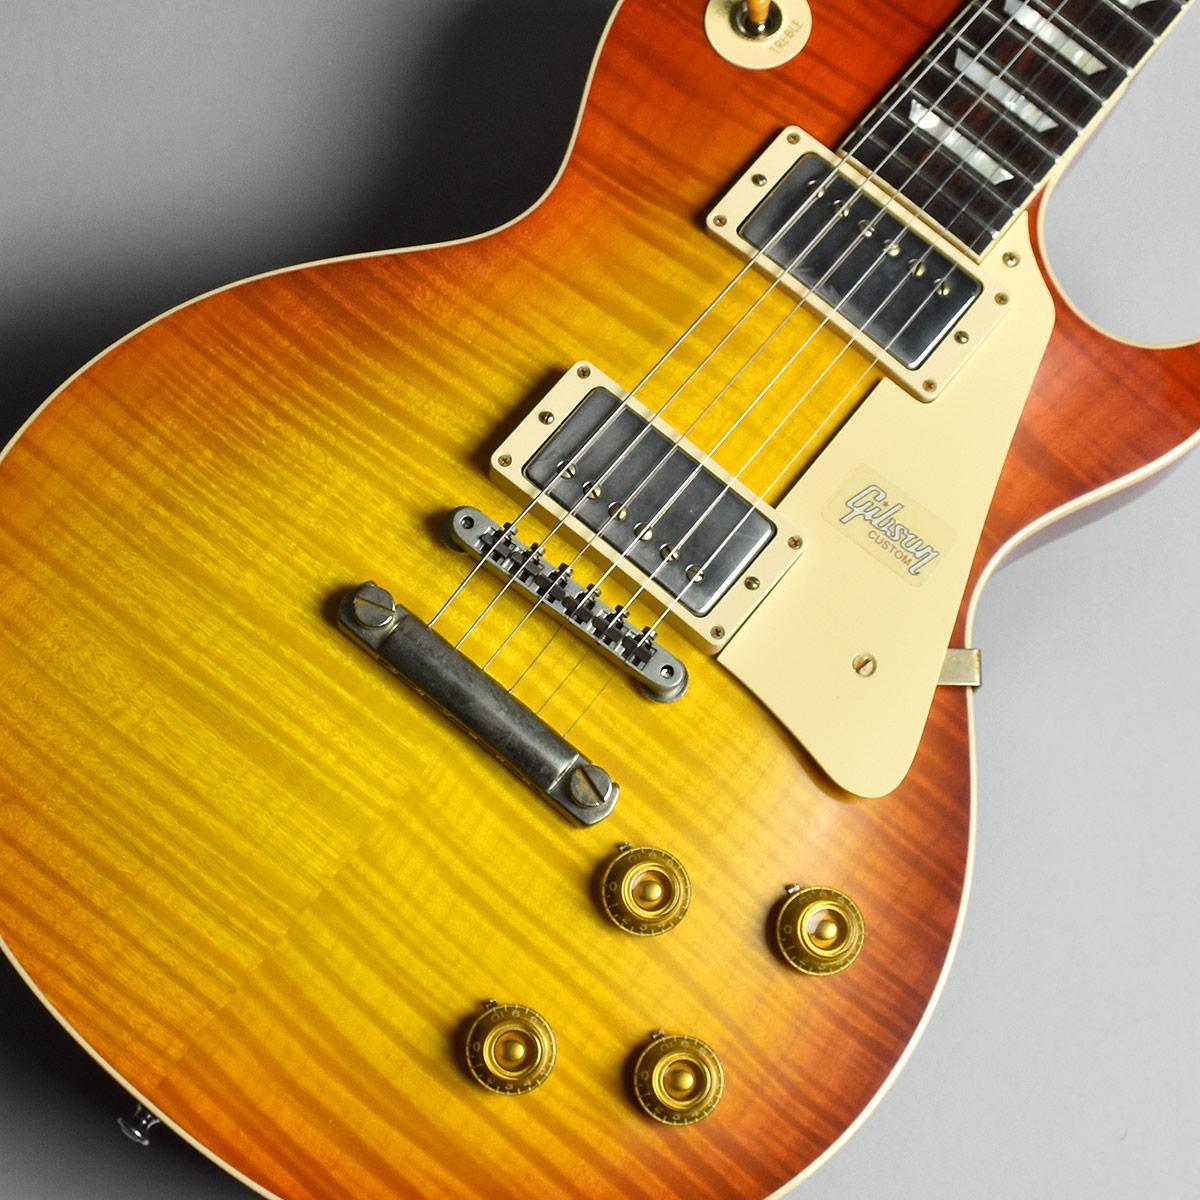 Gibson Custom Shop 1959 Les Paul Standard VOS Sonoran Fade S/N:982211 レスポール・スタンダード 【ギブソン カスタムショップ】【未展示品】